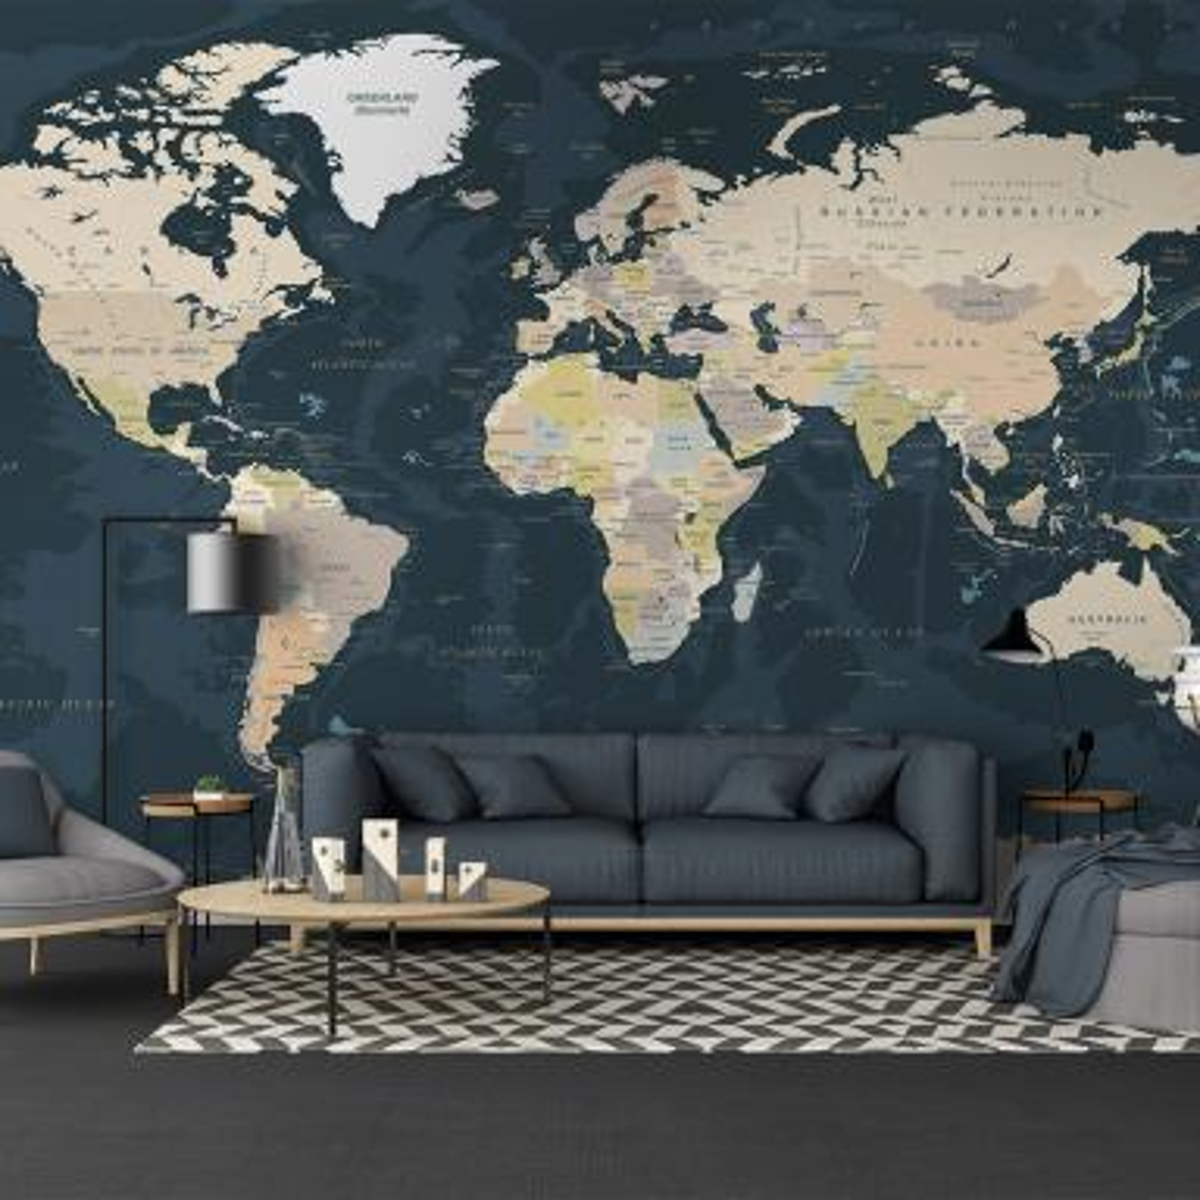 Photo Wallpaper Mural Non-woven 0098803D13 World Map on Brick Wall